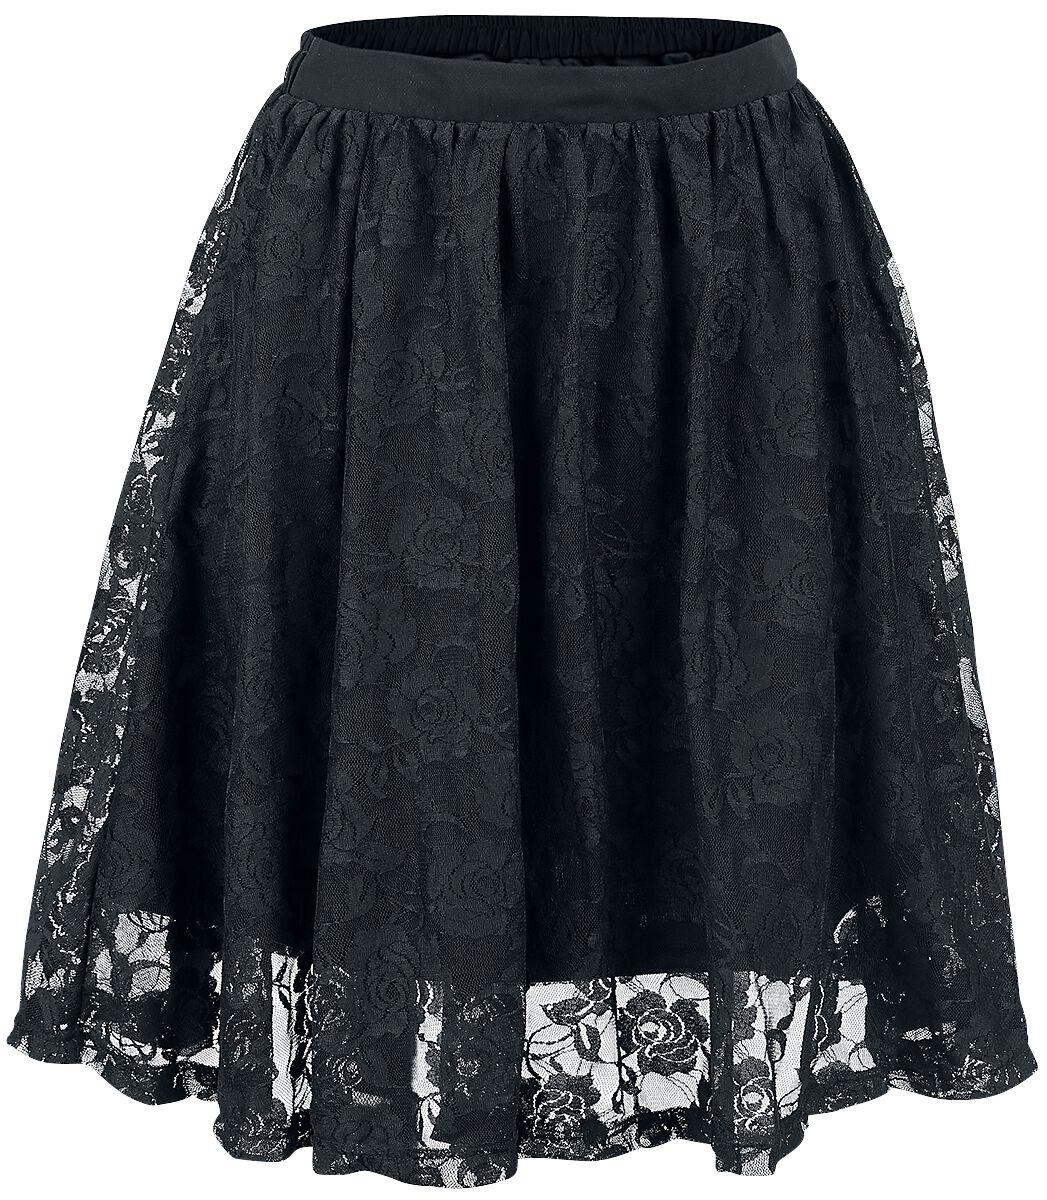 Forplay - Lace Covered Skirt - Kurzer Rock - schwarz - EMP Exklusiv!